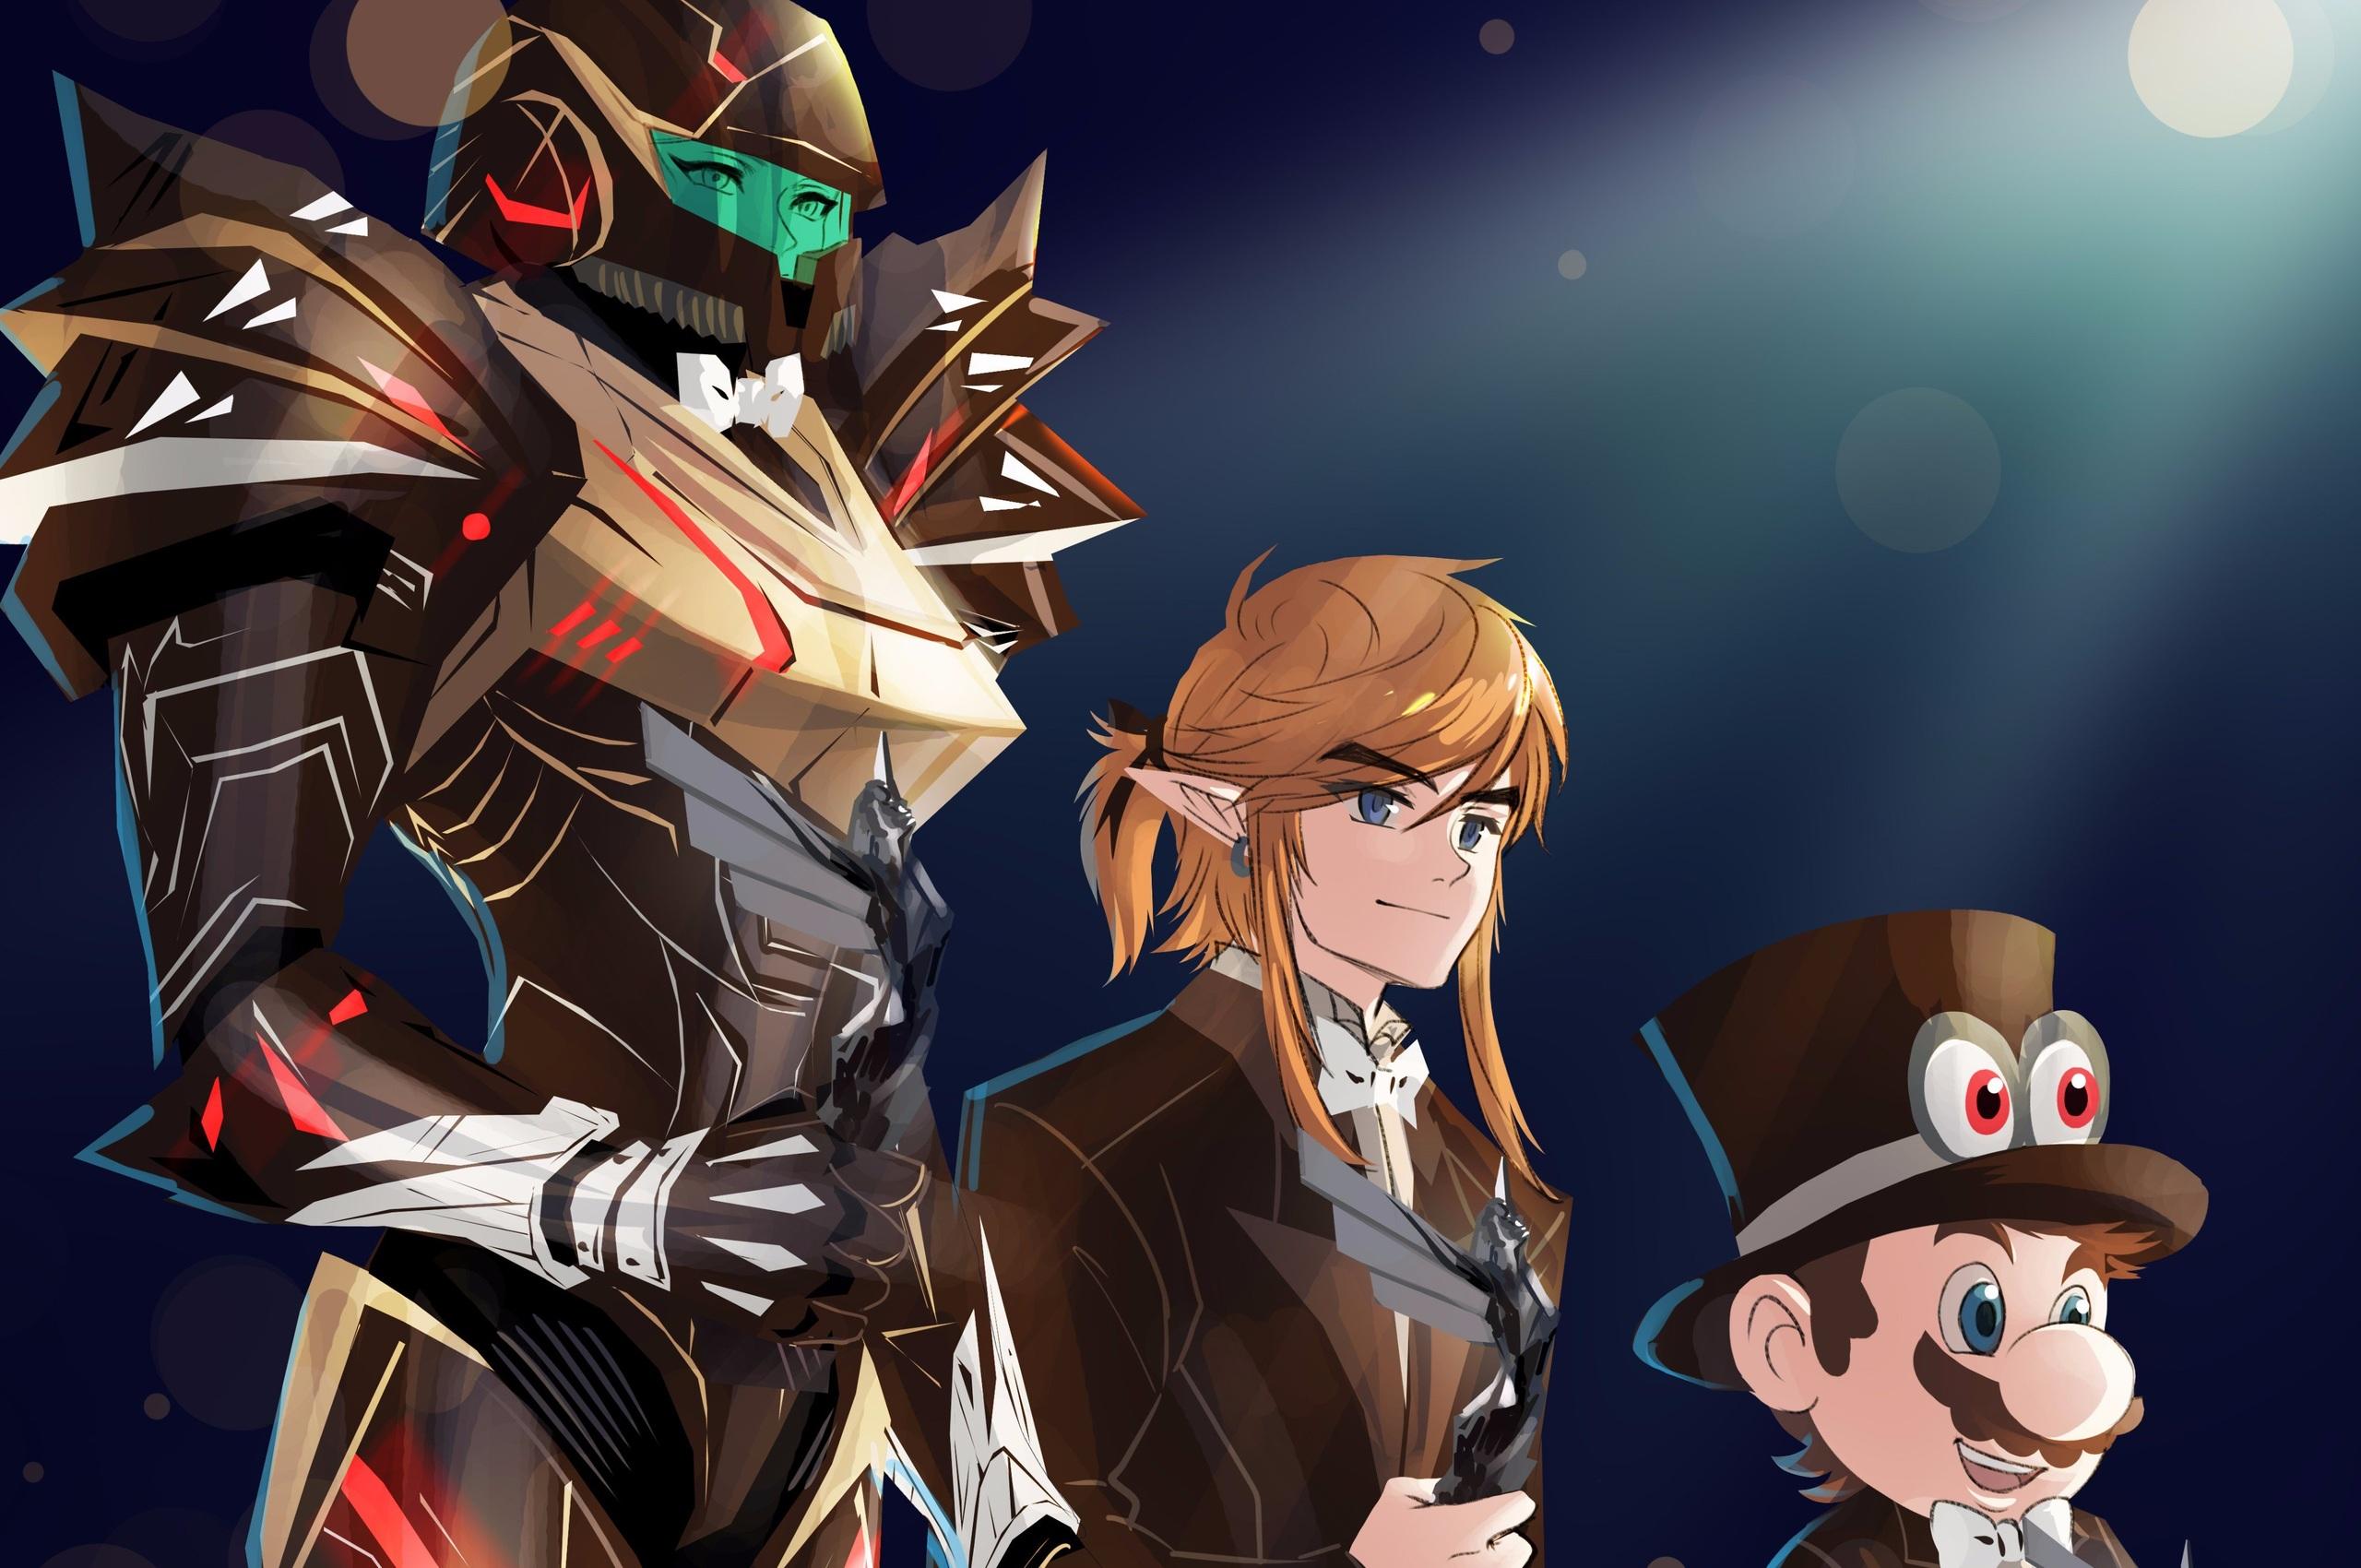 2560x1700 Super Mario Odyssey Samus Aran The Legend Of Zelda